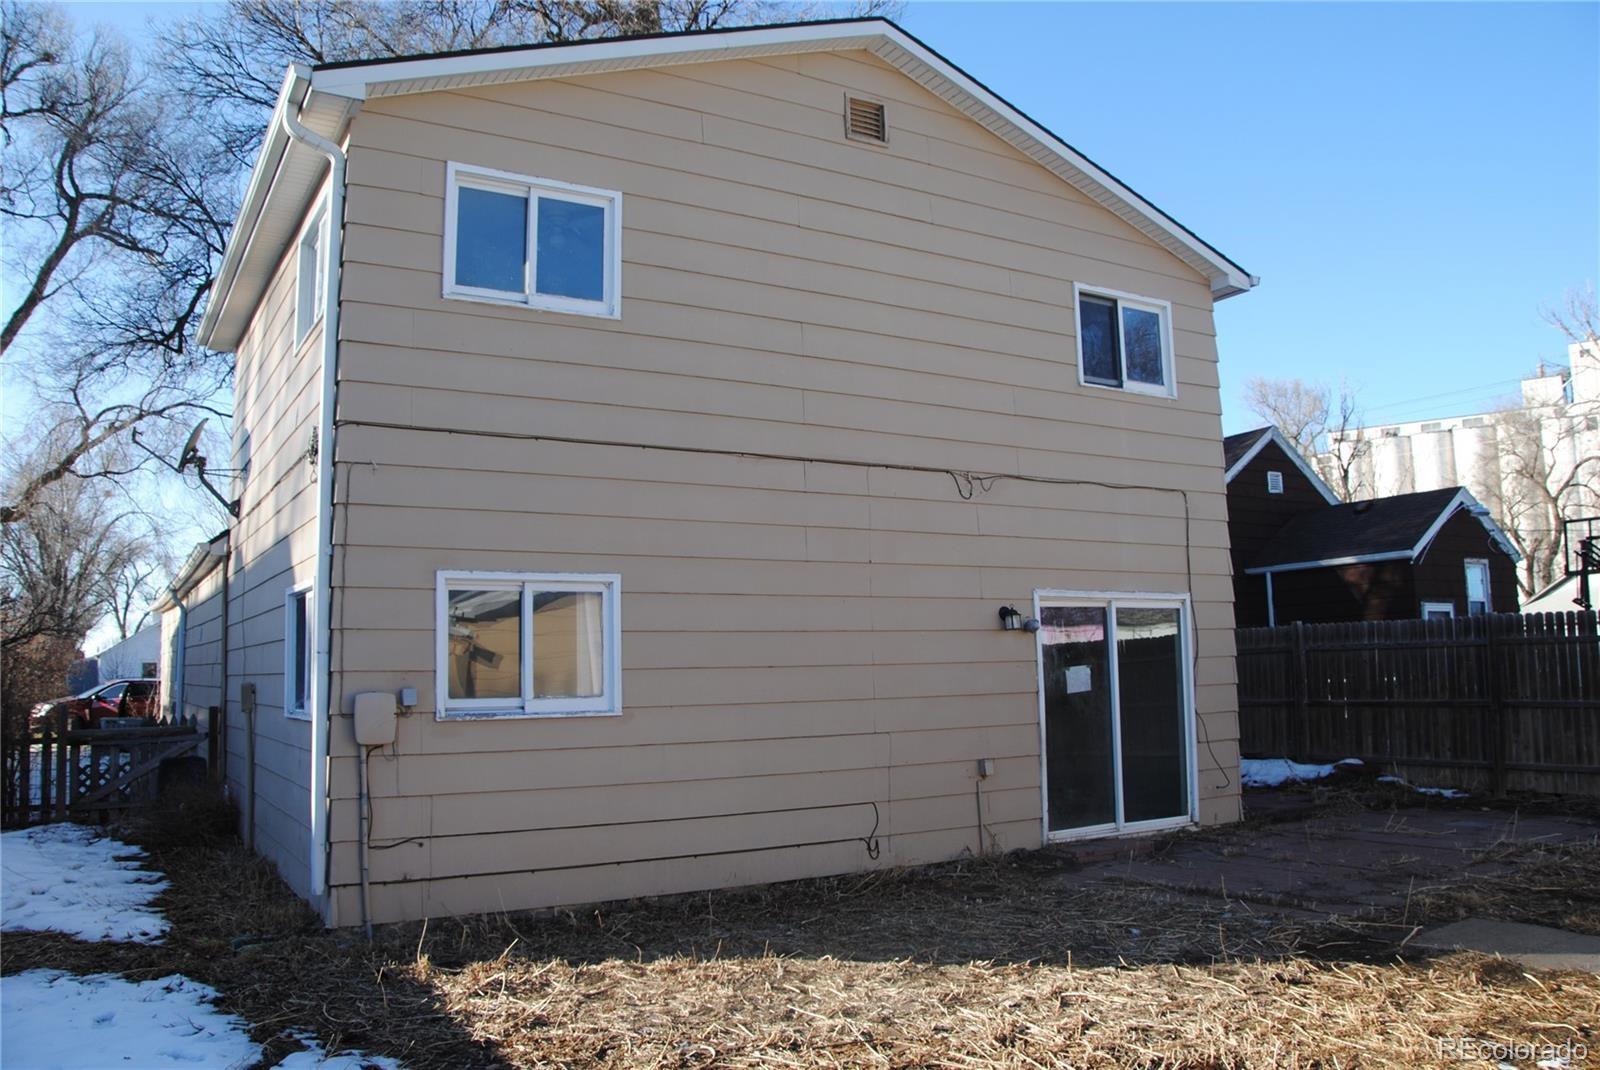 MLS# 4255777 - 14 - 211 S Belford , Holyoke, CO 80734